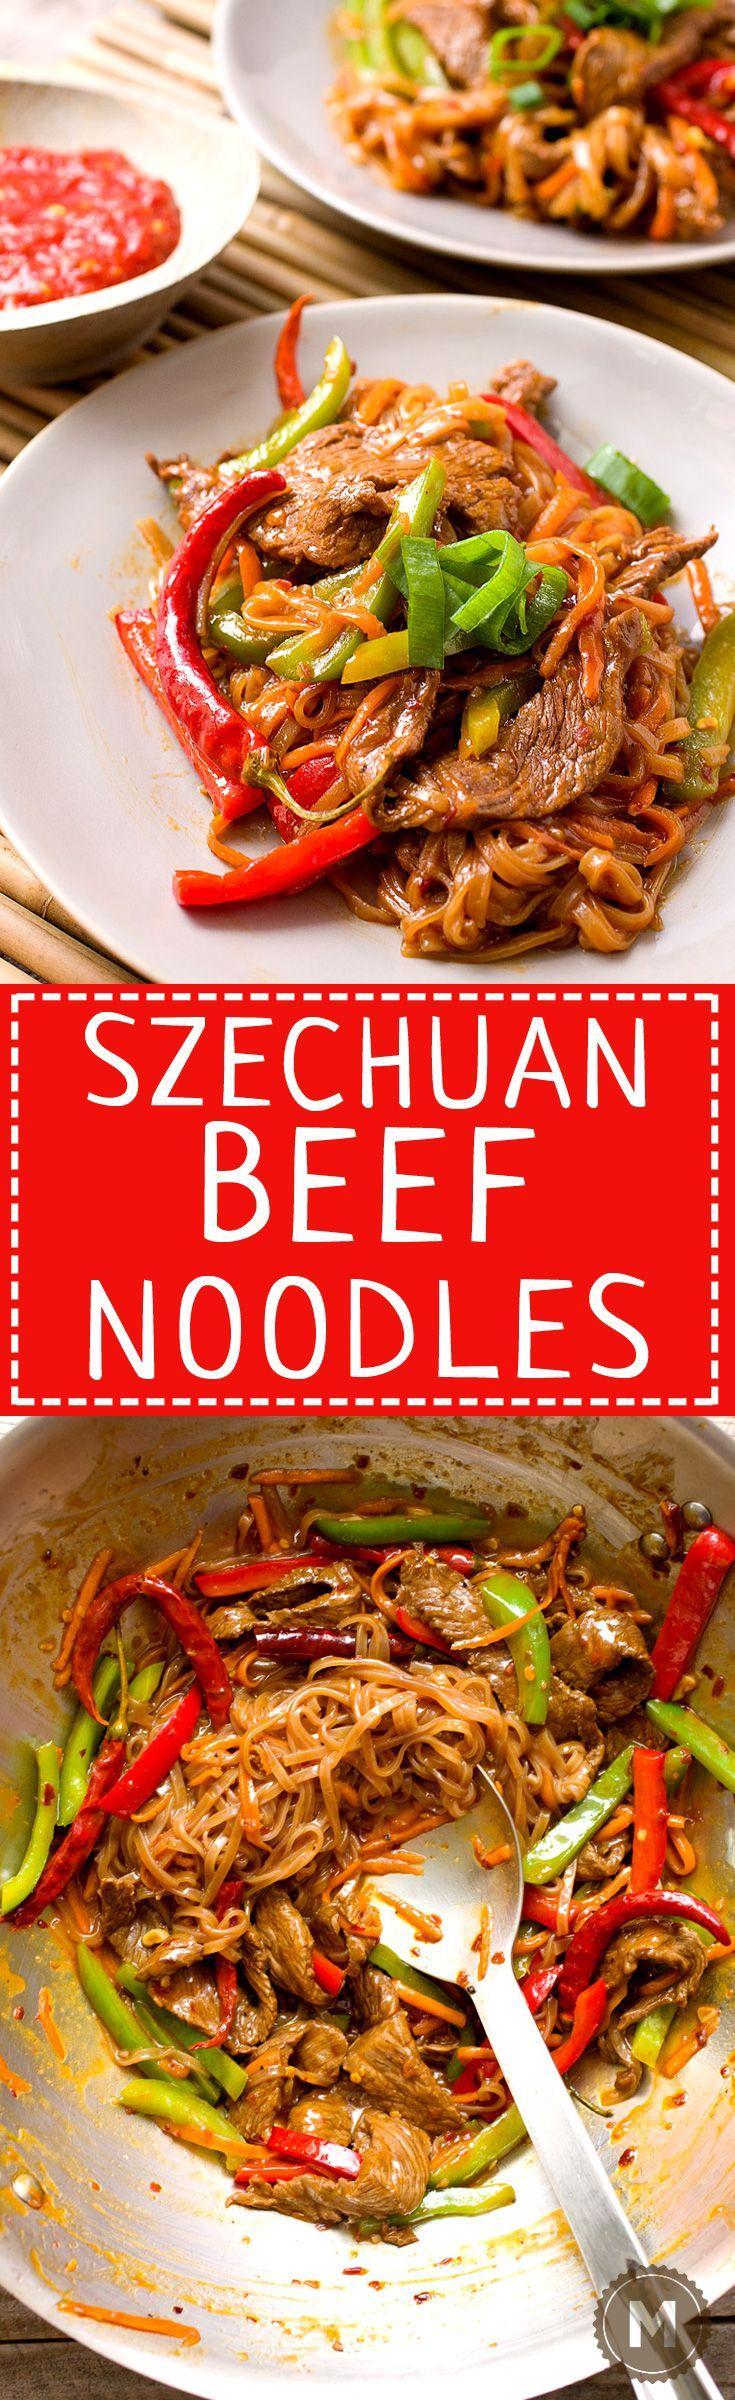 Szechuan Beef Noodles   Receta   Fideos, Platos y Carne de ternera